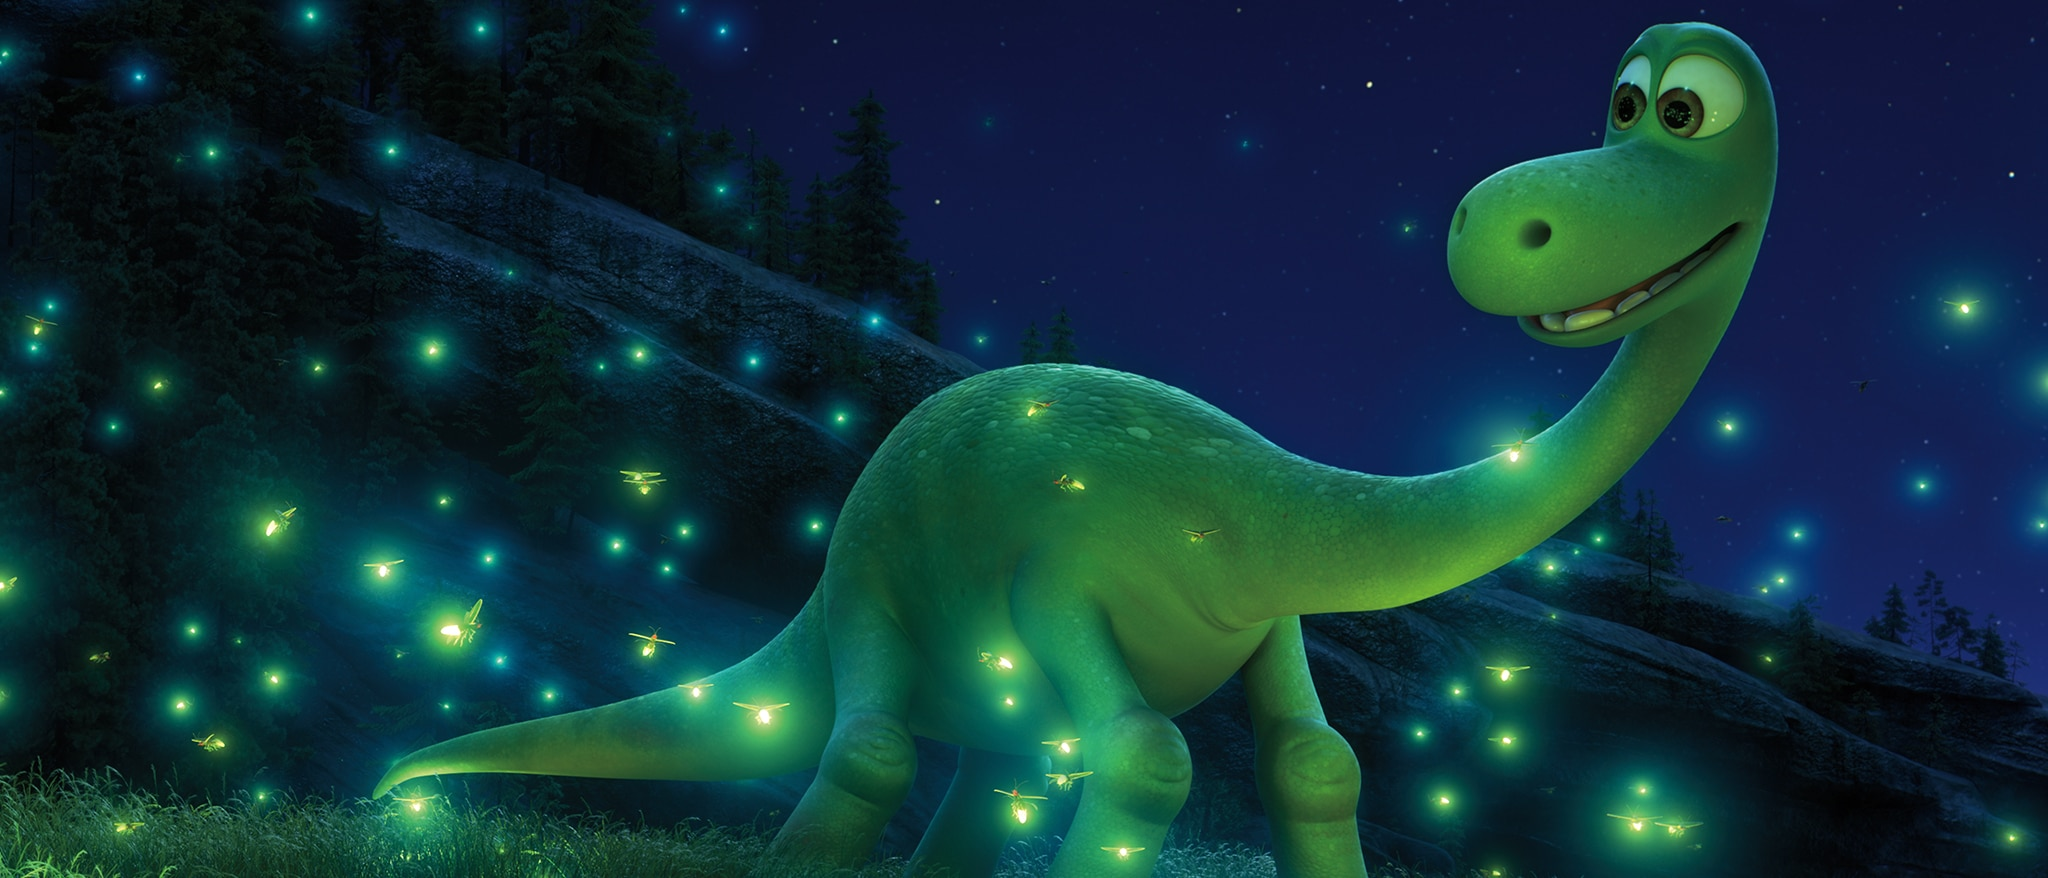 The Good Dinosaur Hero